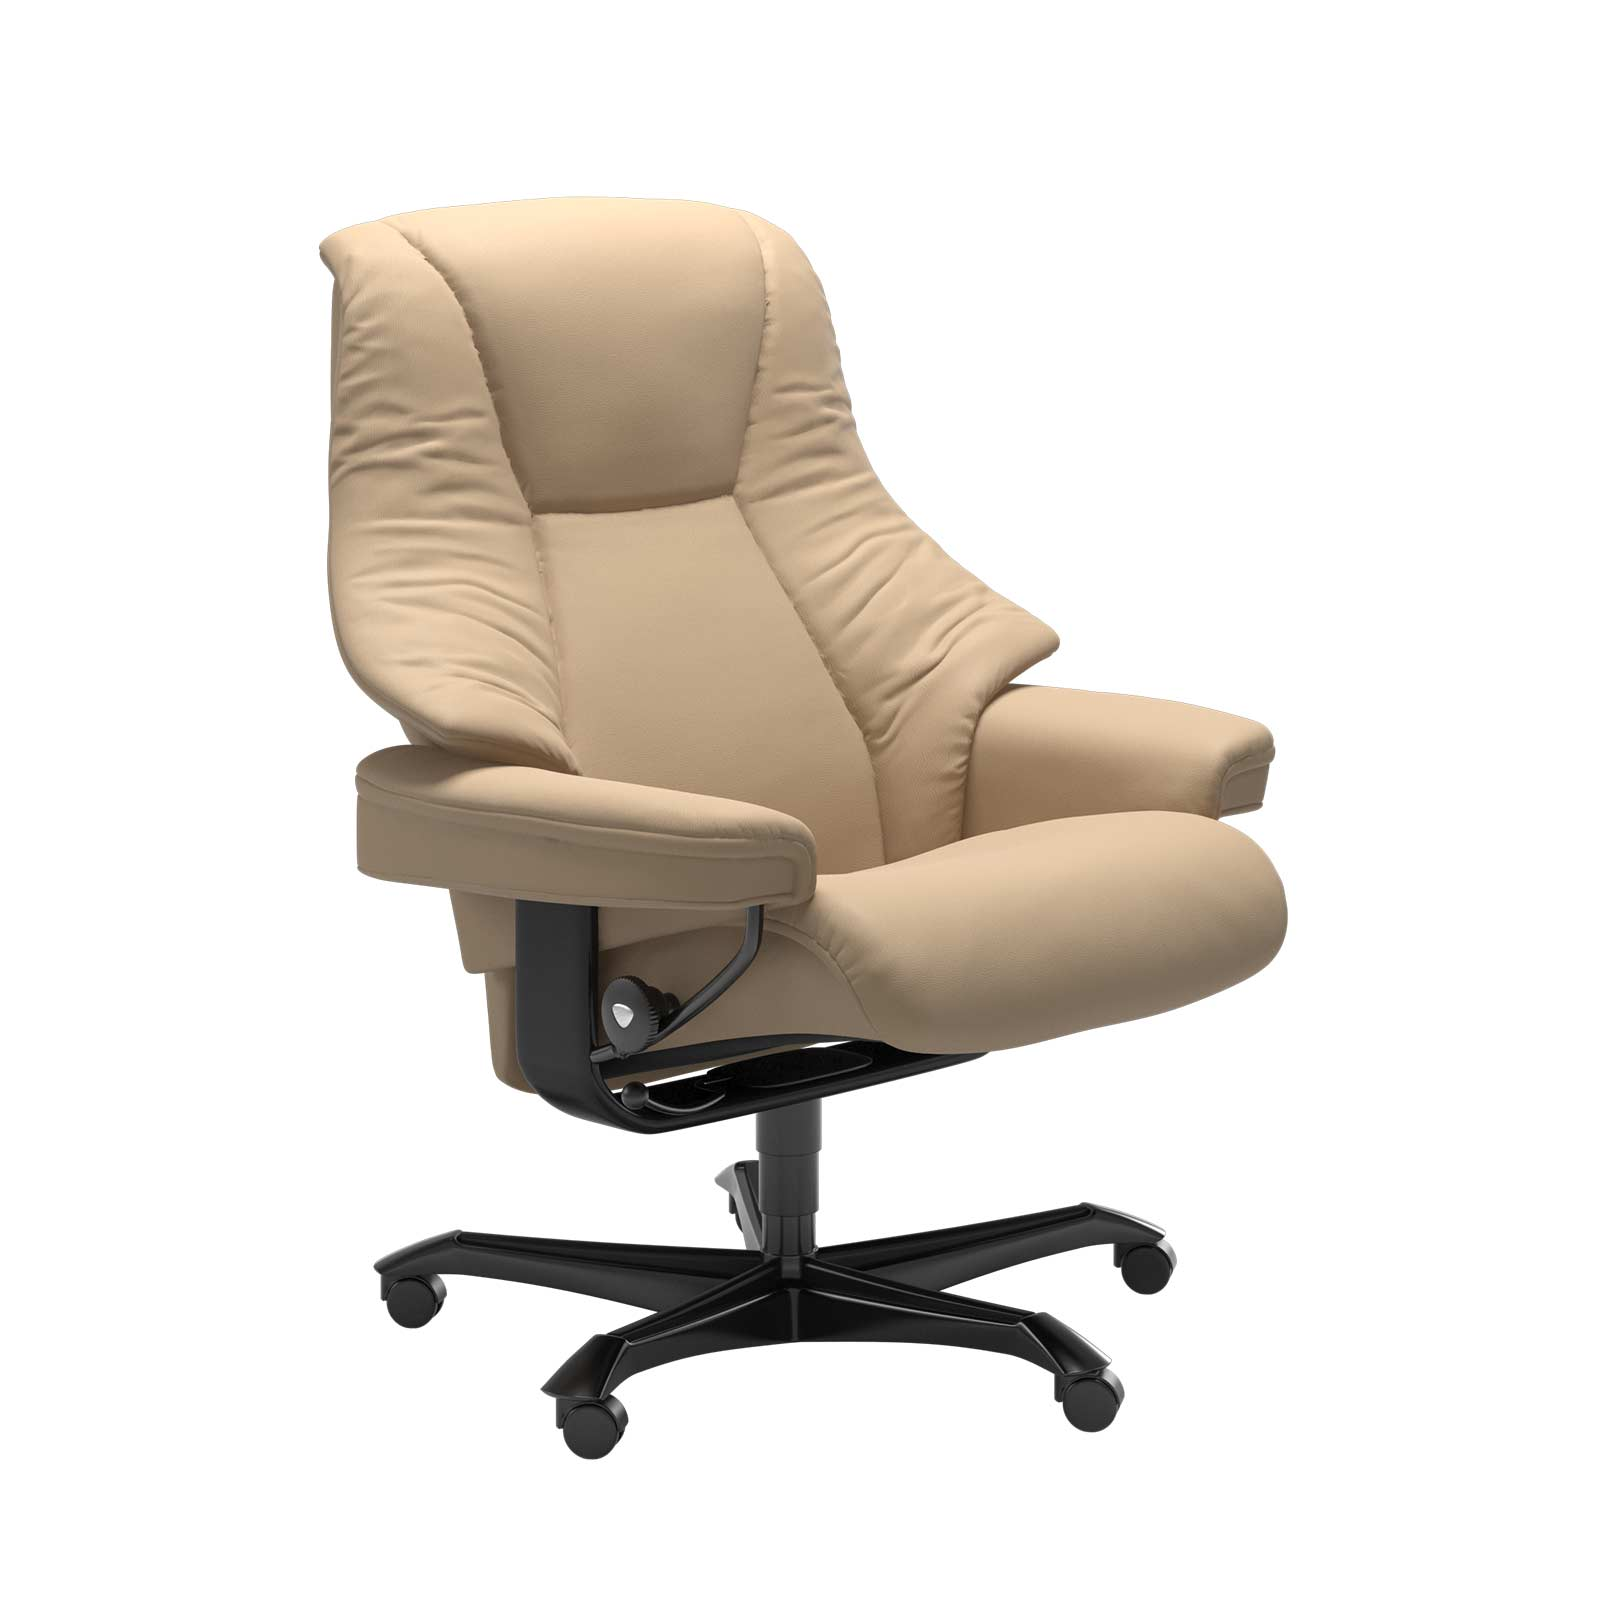 Stressless Sessel LIVE Home Office Leder Paloma beige